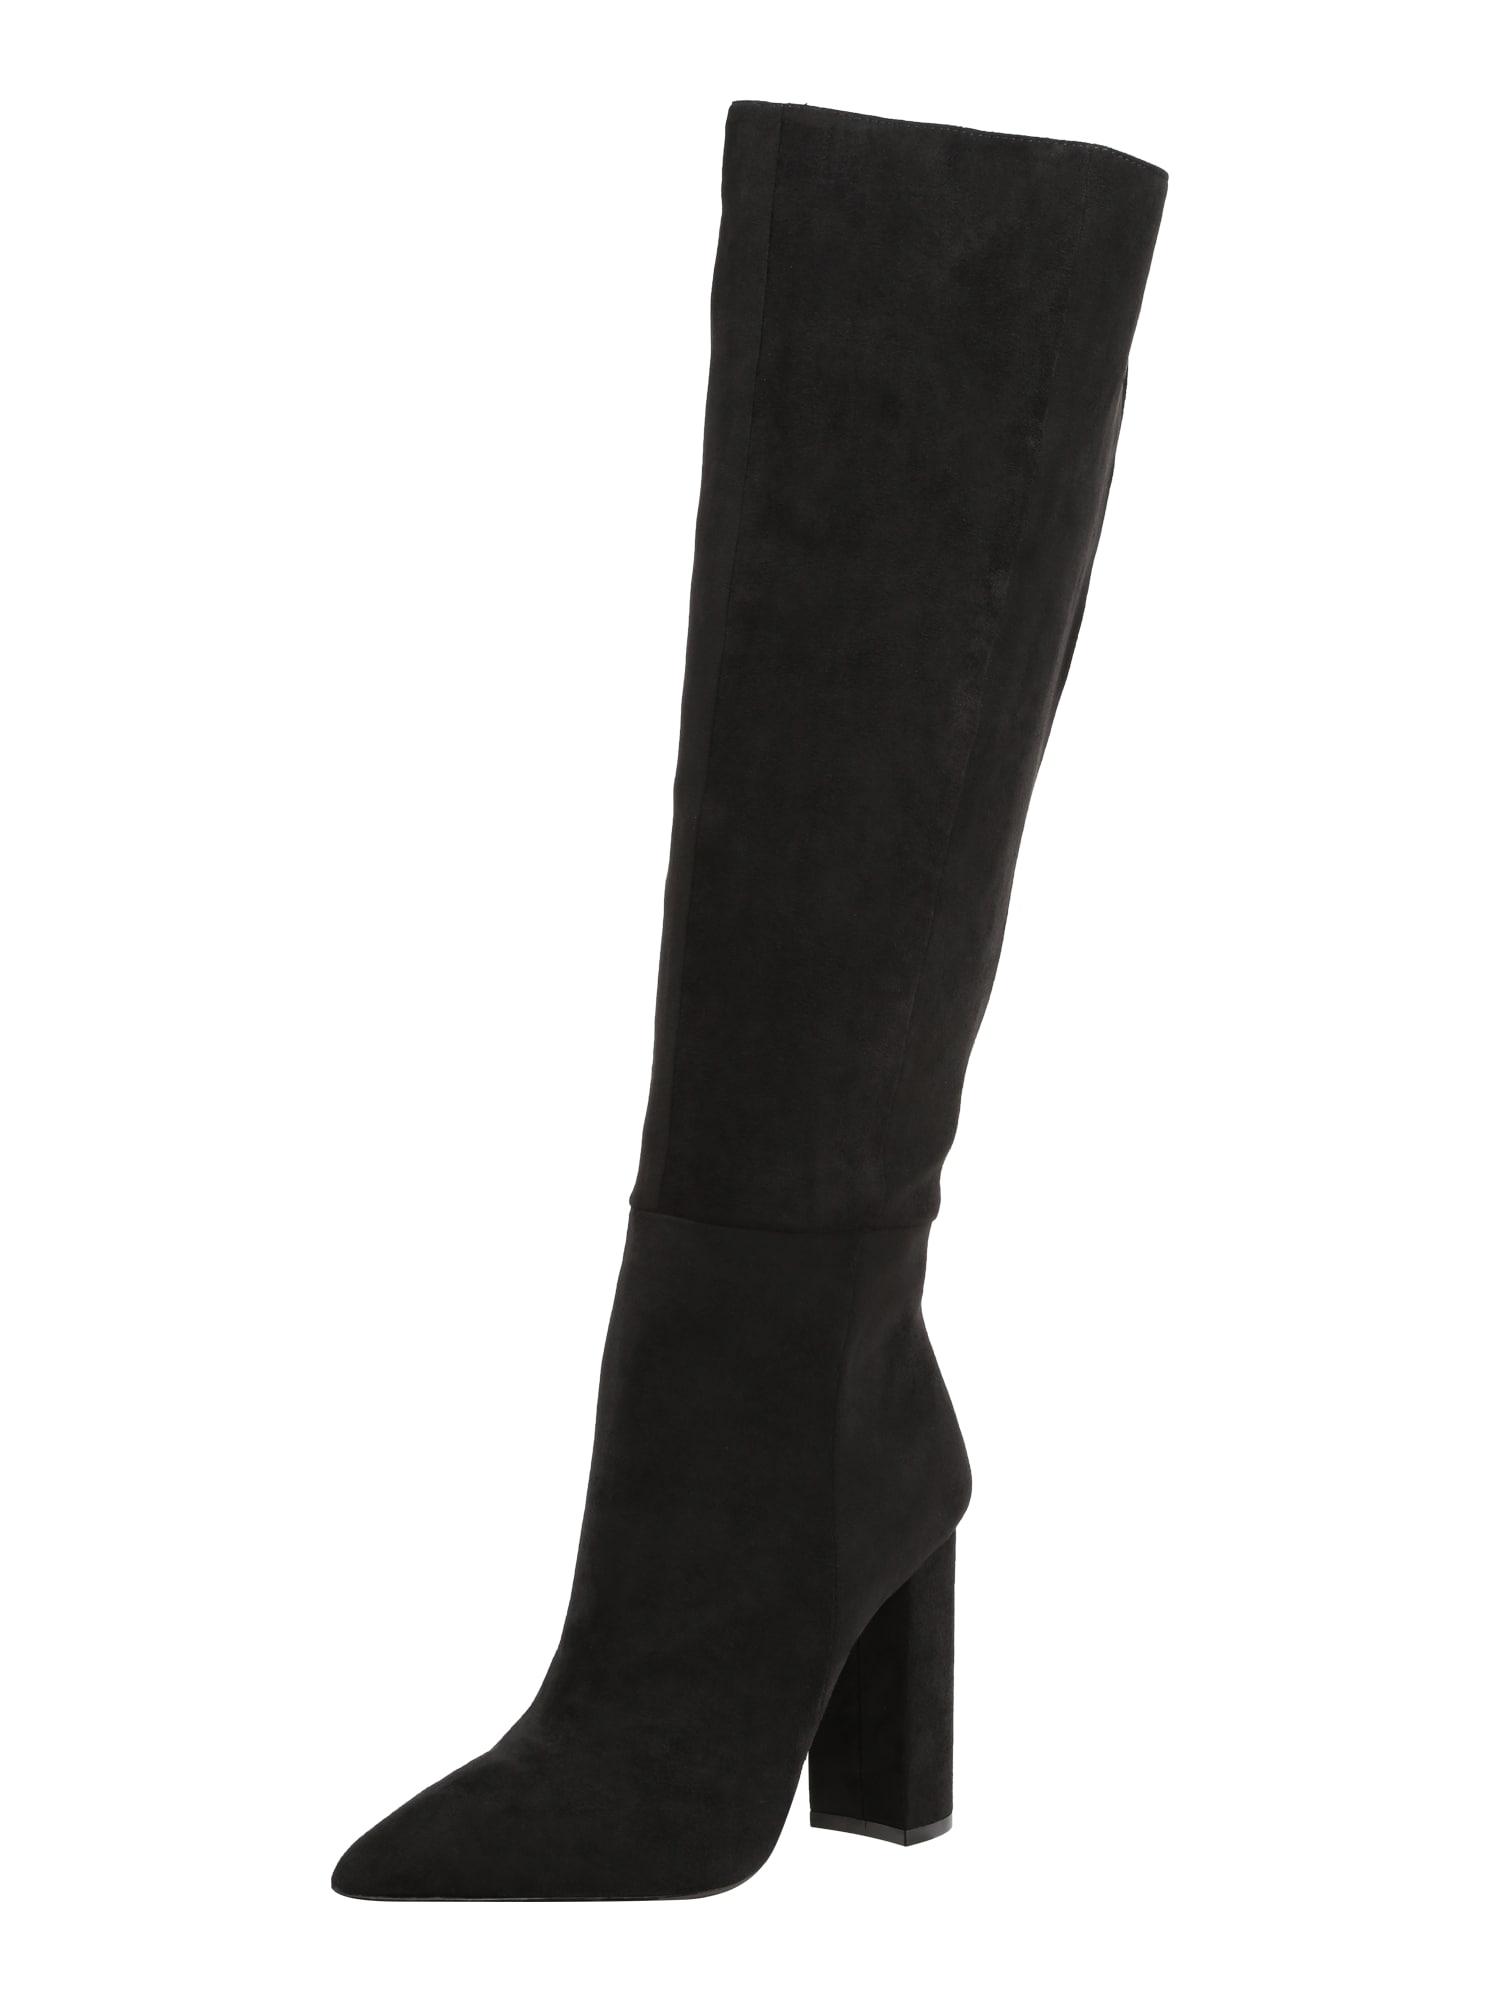 BUFFALO Auliniai batai su kulniuku 'FINKA' juoda